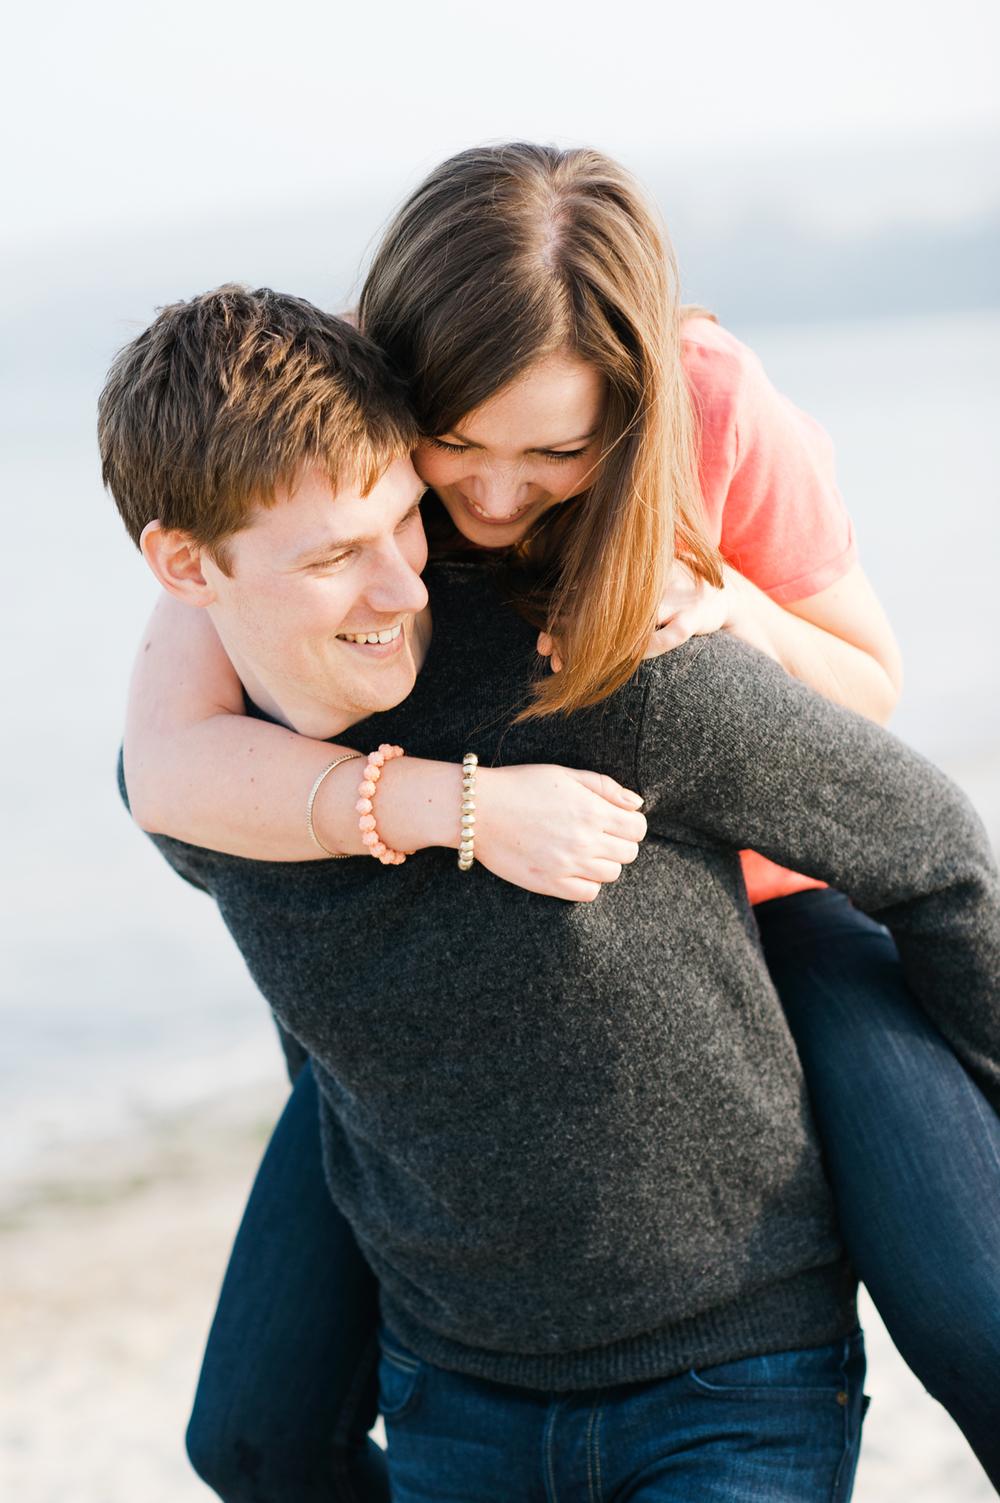 Couples-034.jpg